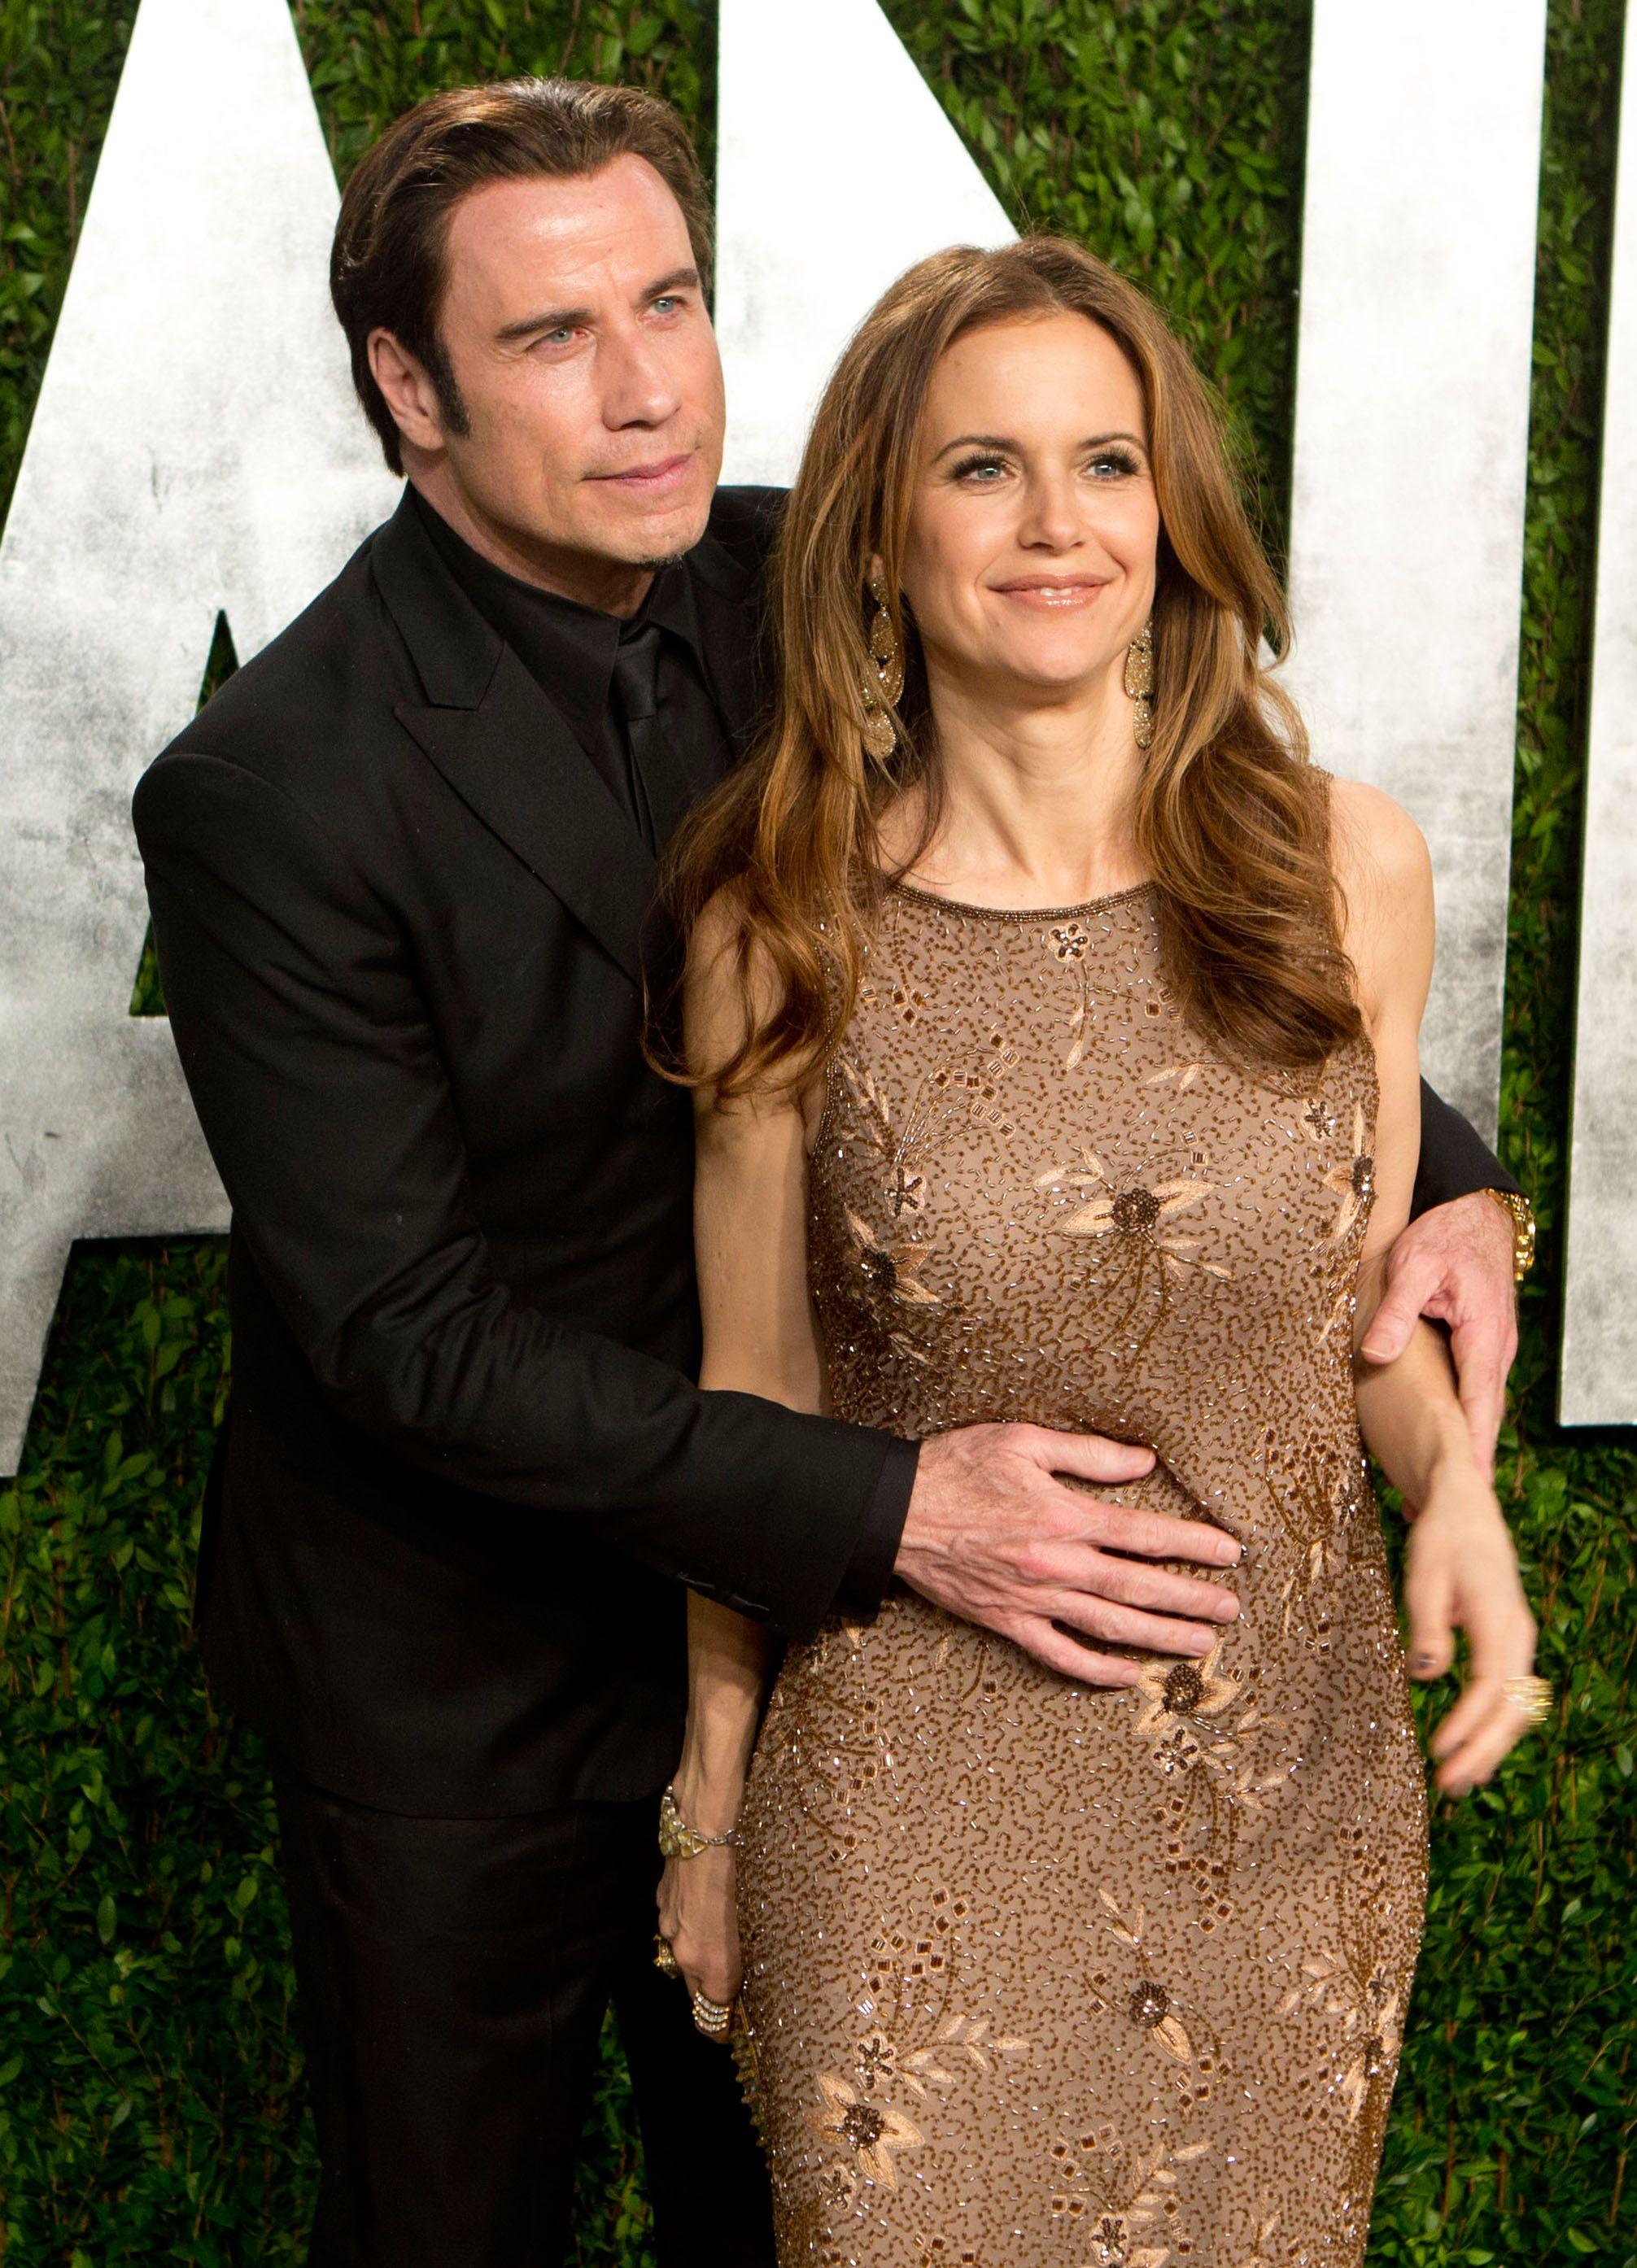 john travolta with wife - Google Search | Celebrity couples, John ...